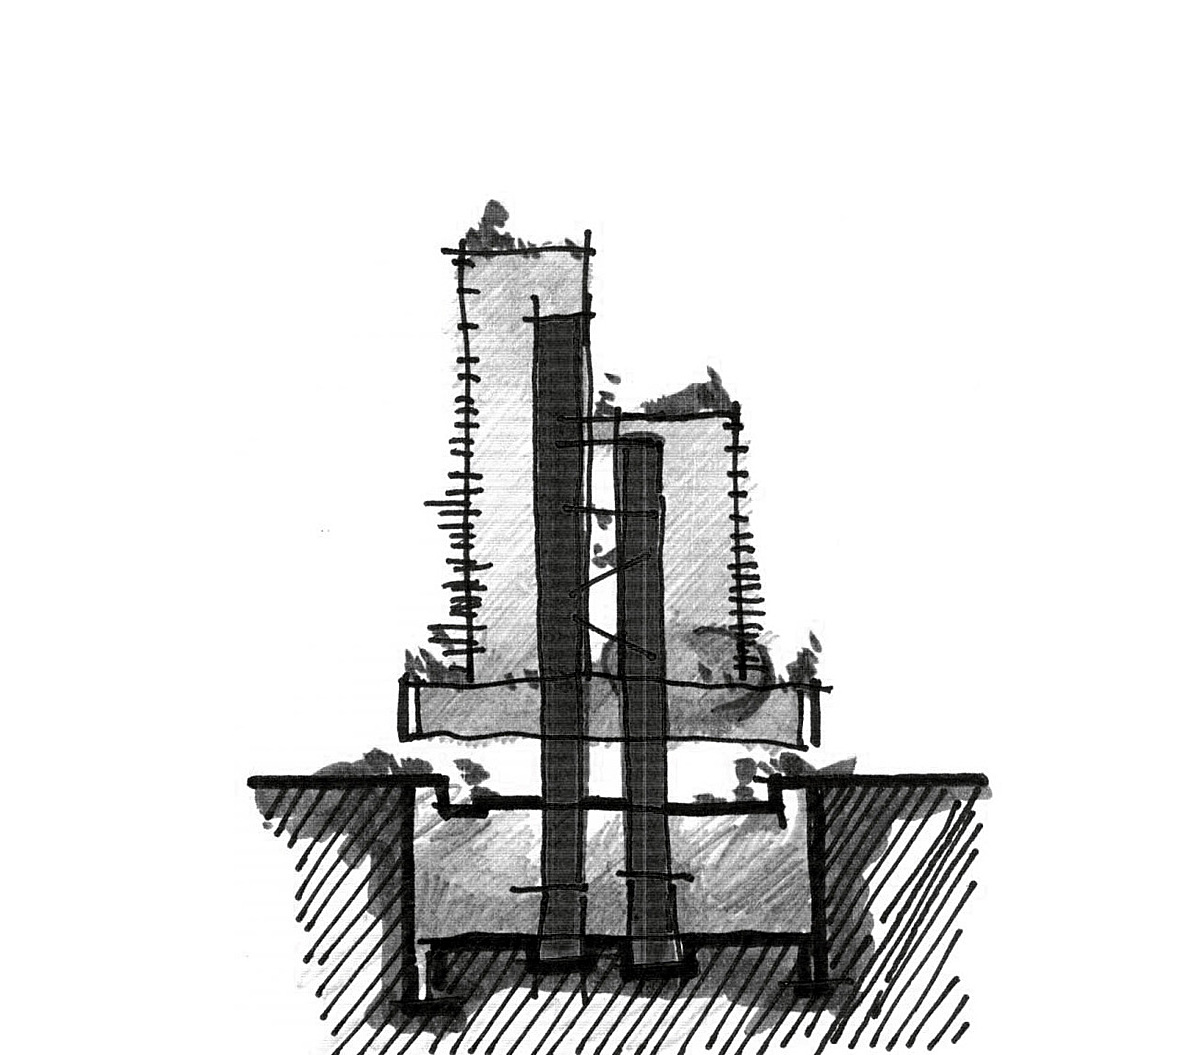 Sketch - section diagram